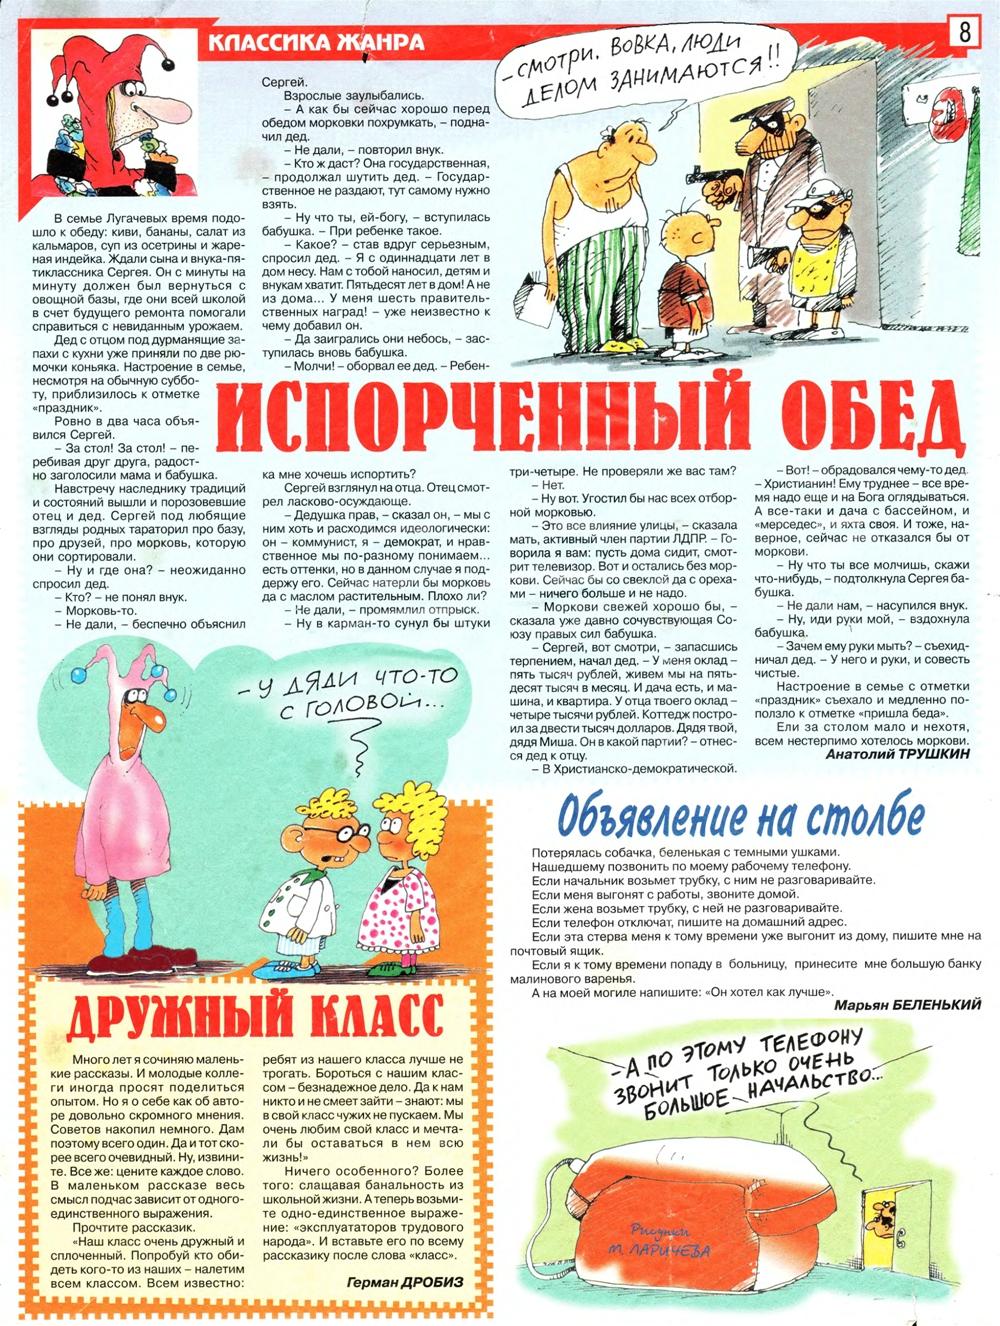 http://i1.imageban.ru/out/2013/12/21/651324aca2f5e12da61668d0bb9a1bbc.jpg